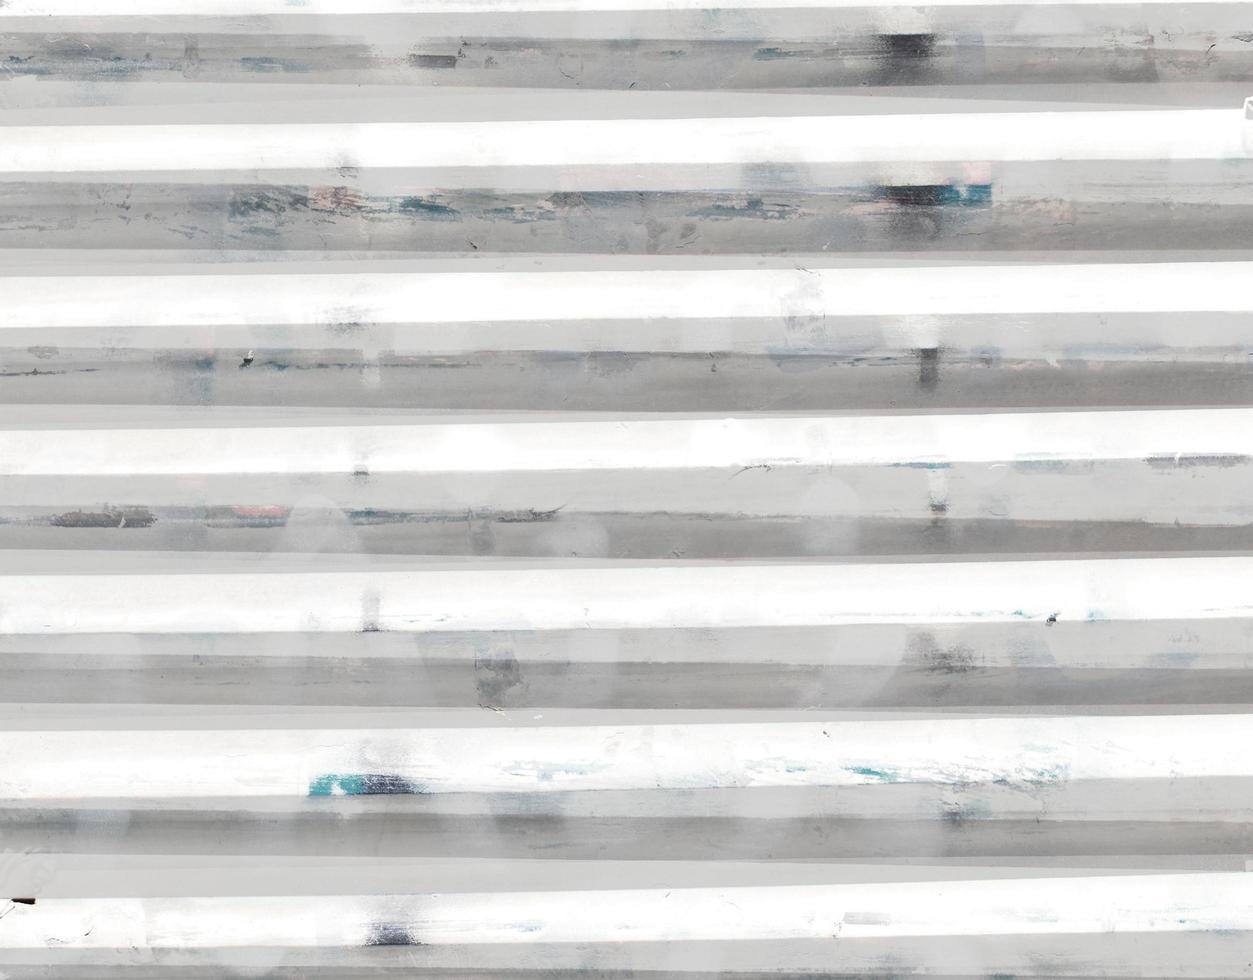 abstrakte Oxidstahlstruktur foto